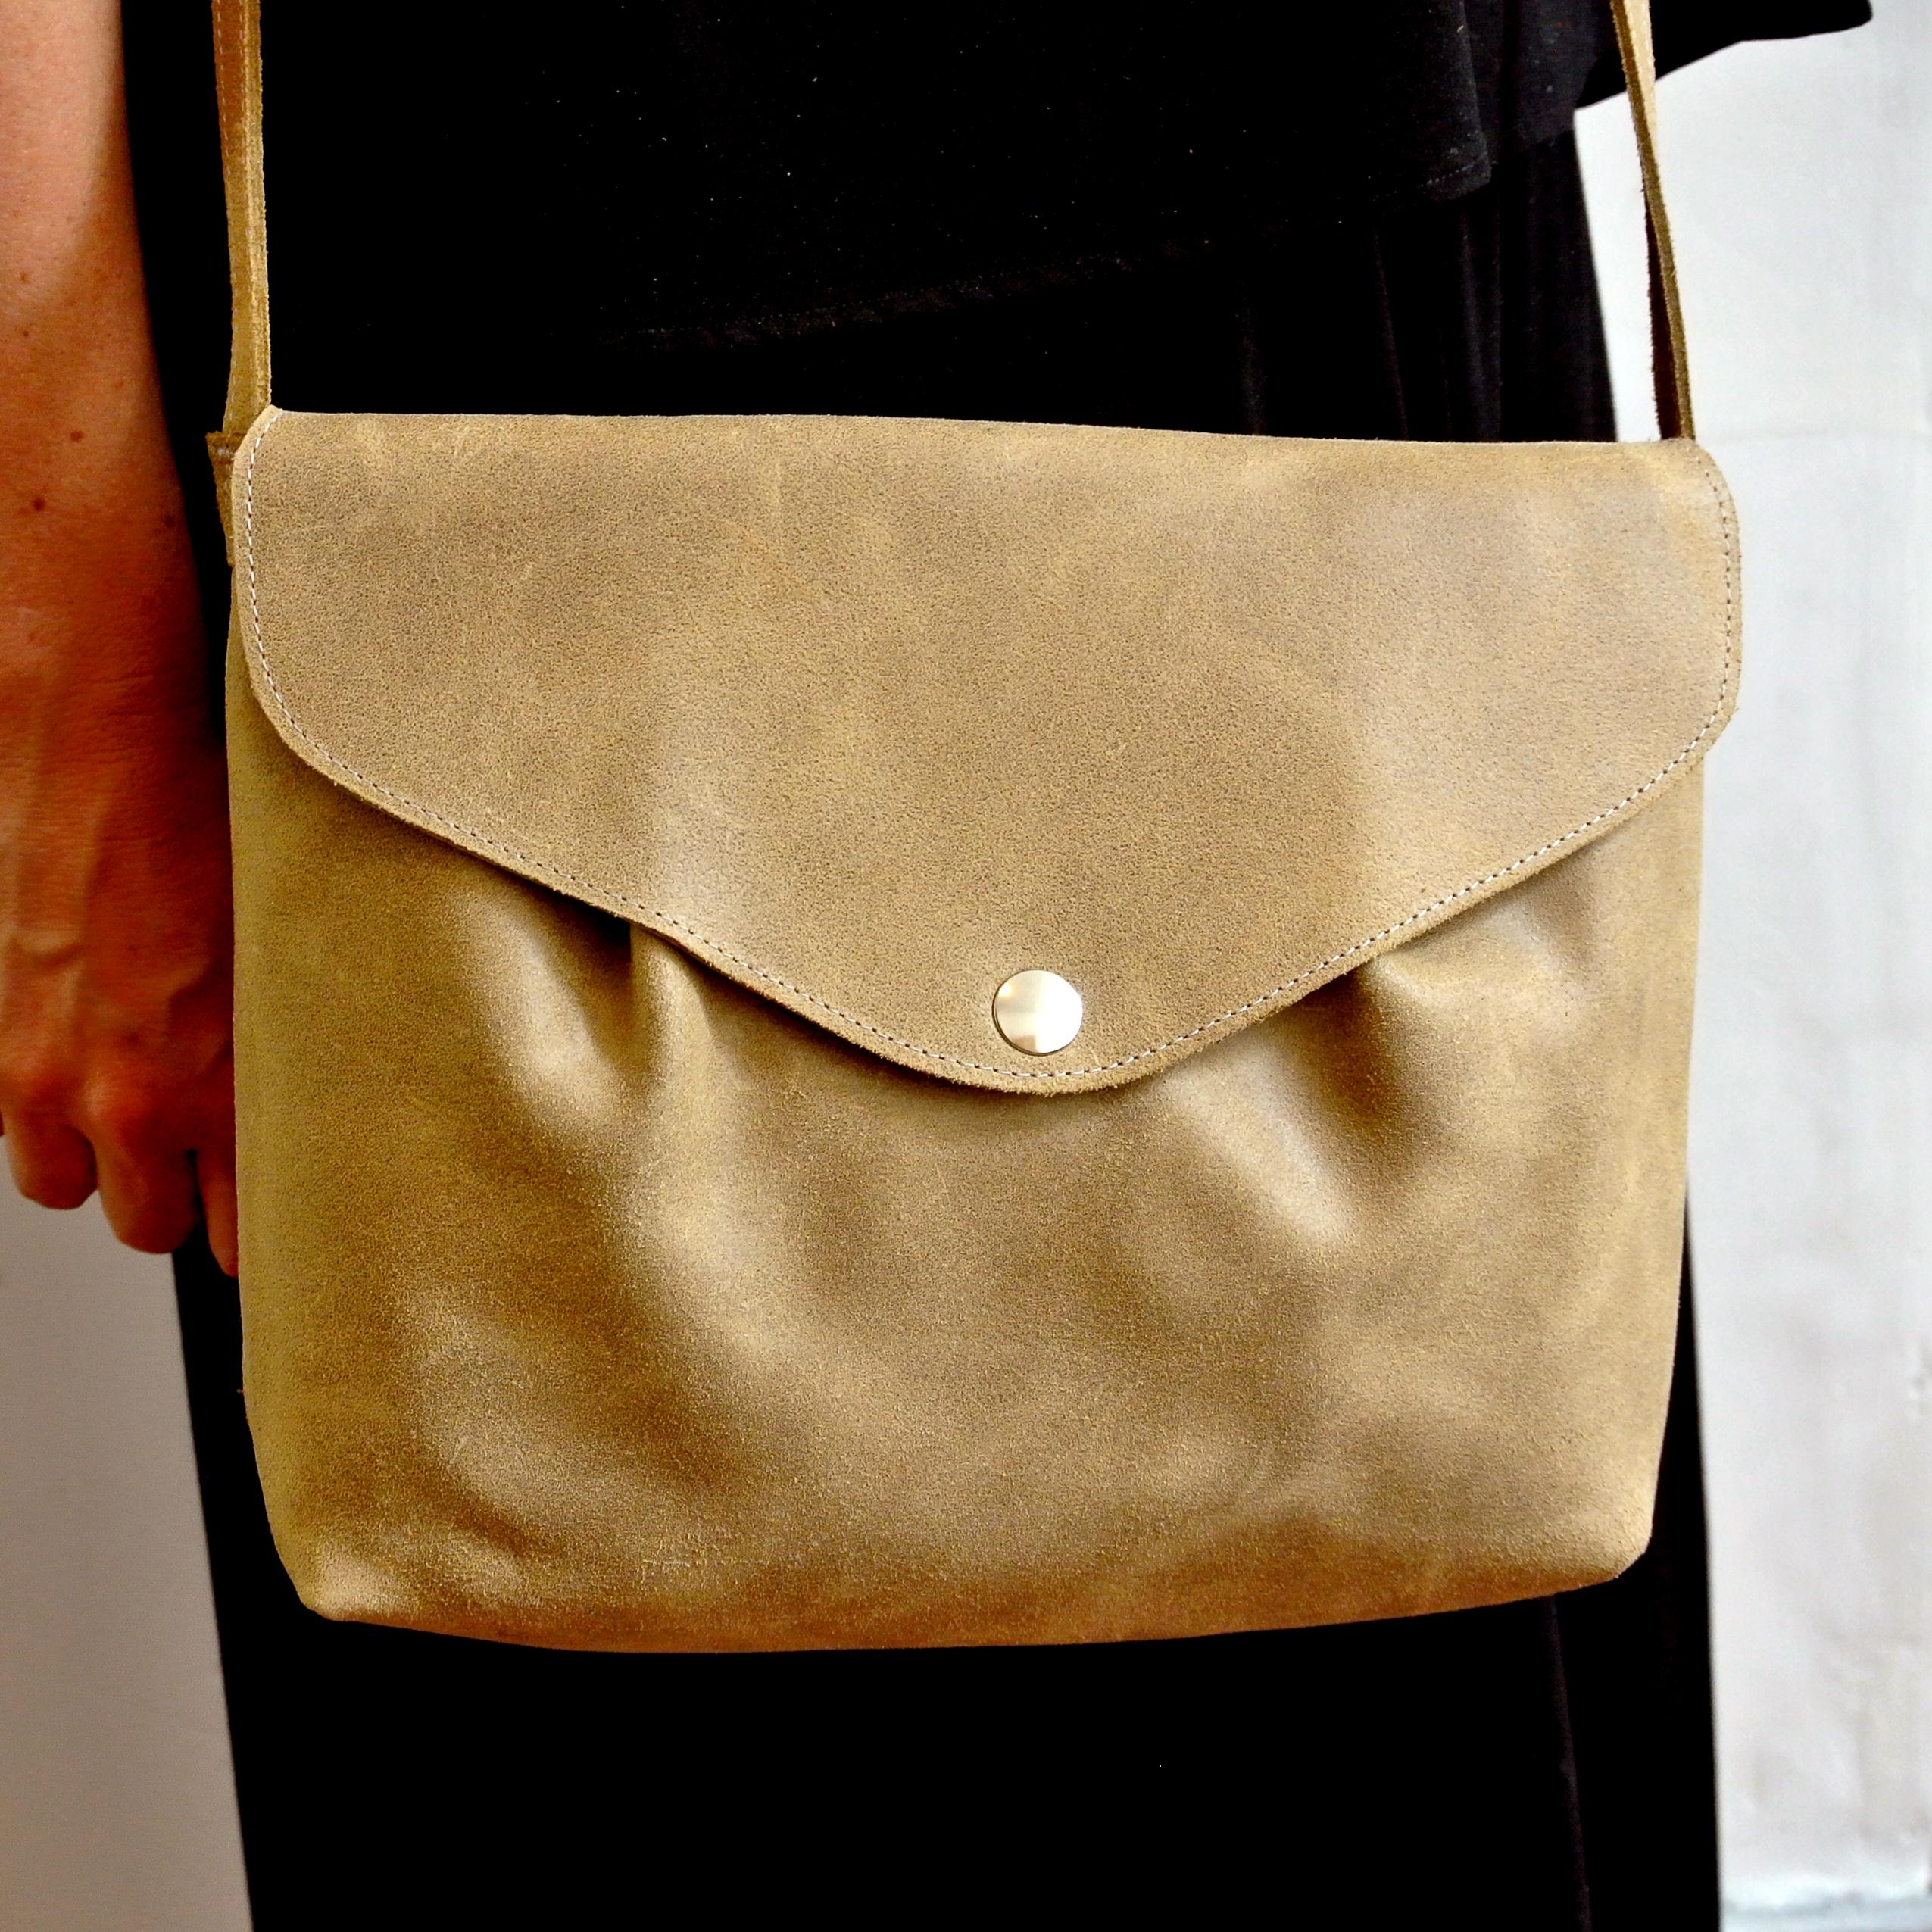 Midi sac à pinces en cuir, bandoulière en cuir, cuir rétro, cuir pleine fleur, made in france, la Cartablière